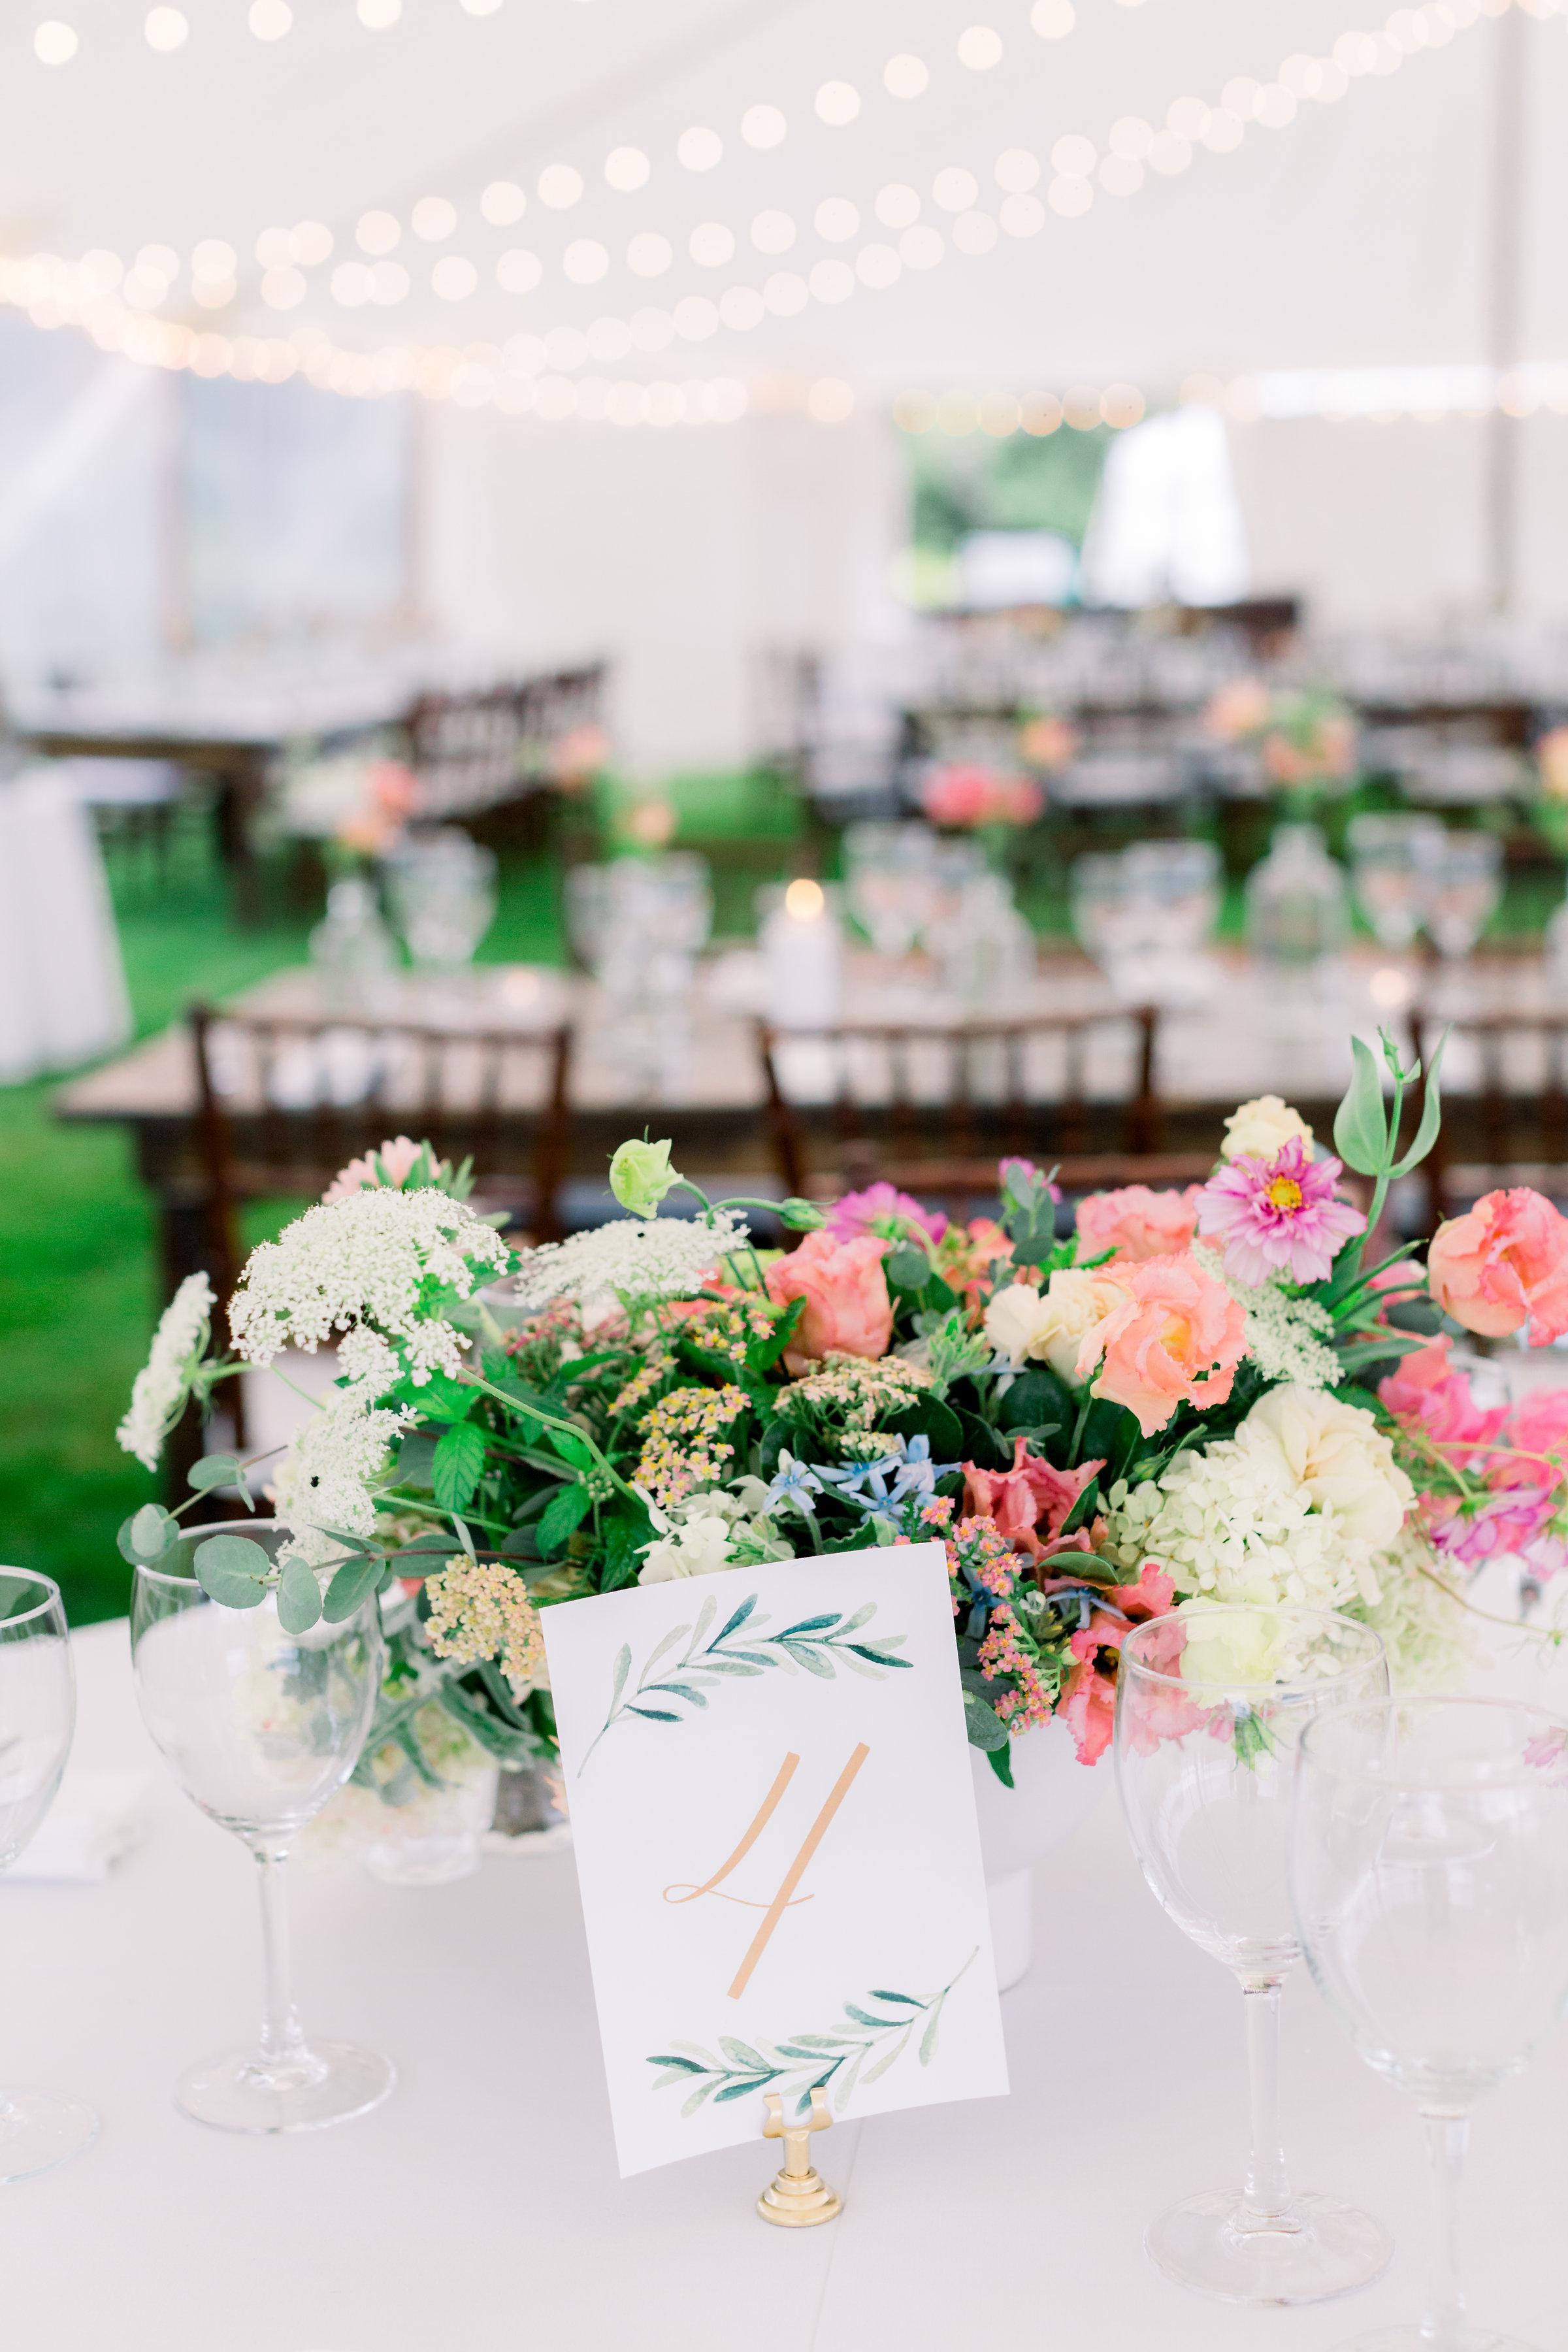 Watershed_Floral_Newagen_Wedding_Maine_6038.jpg